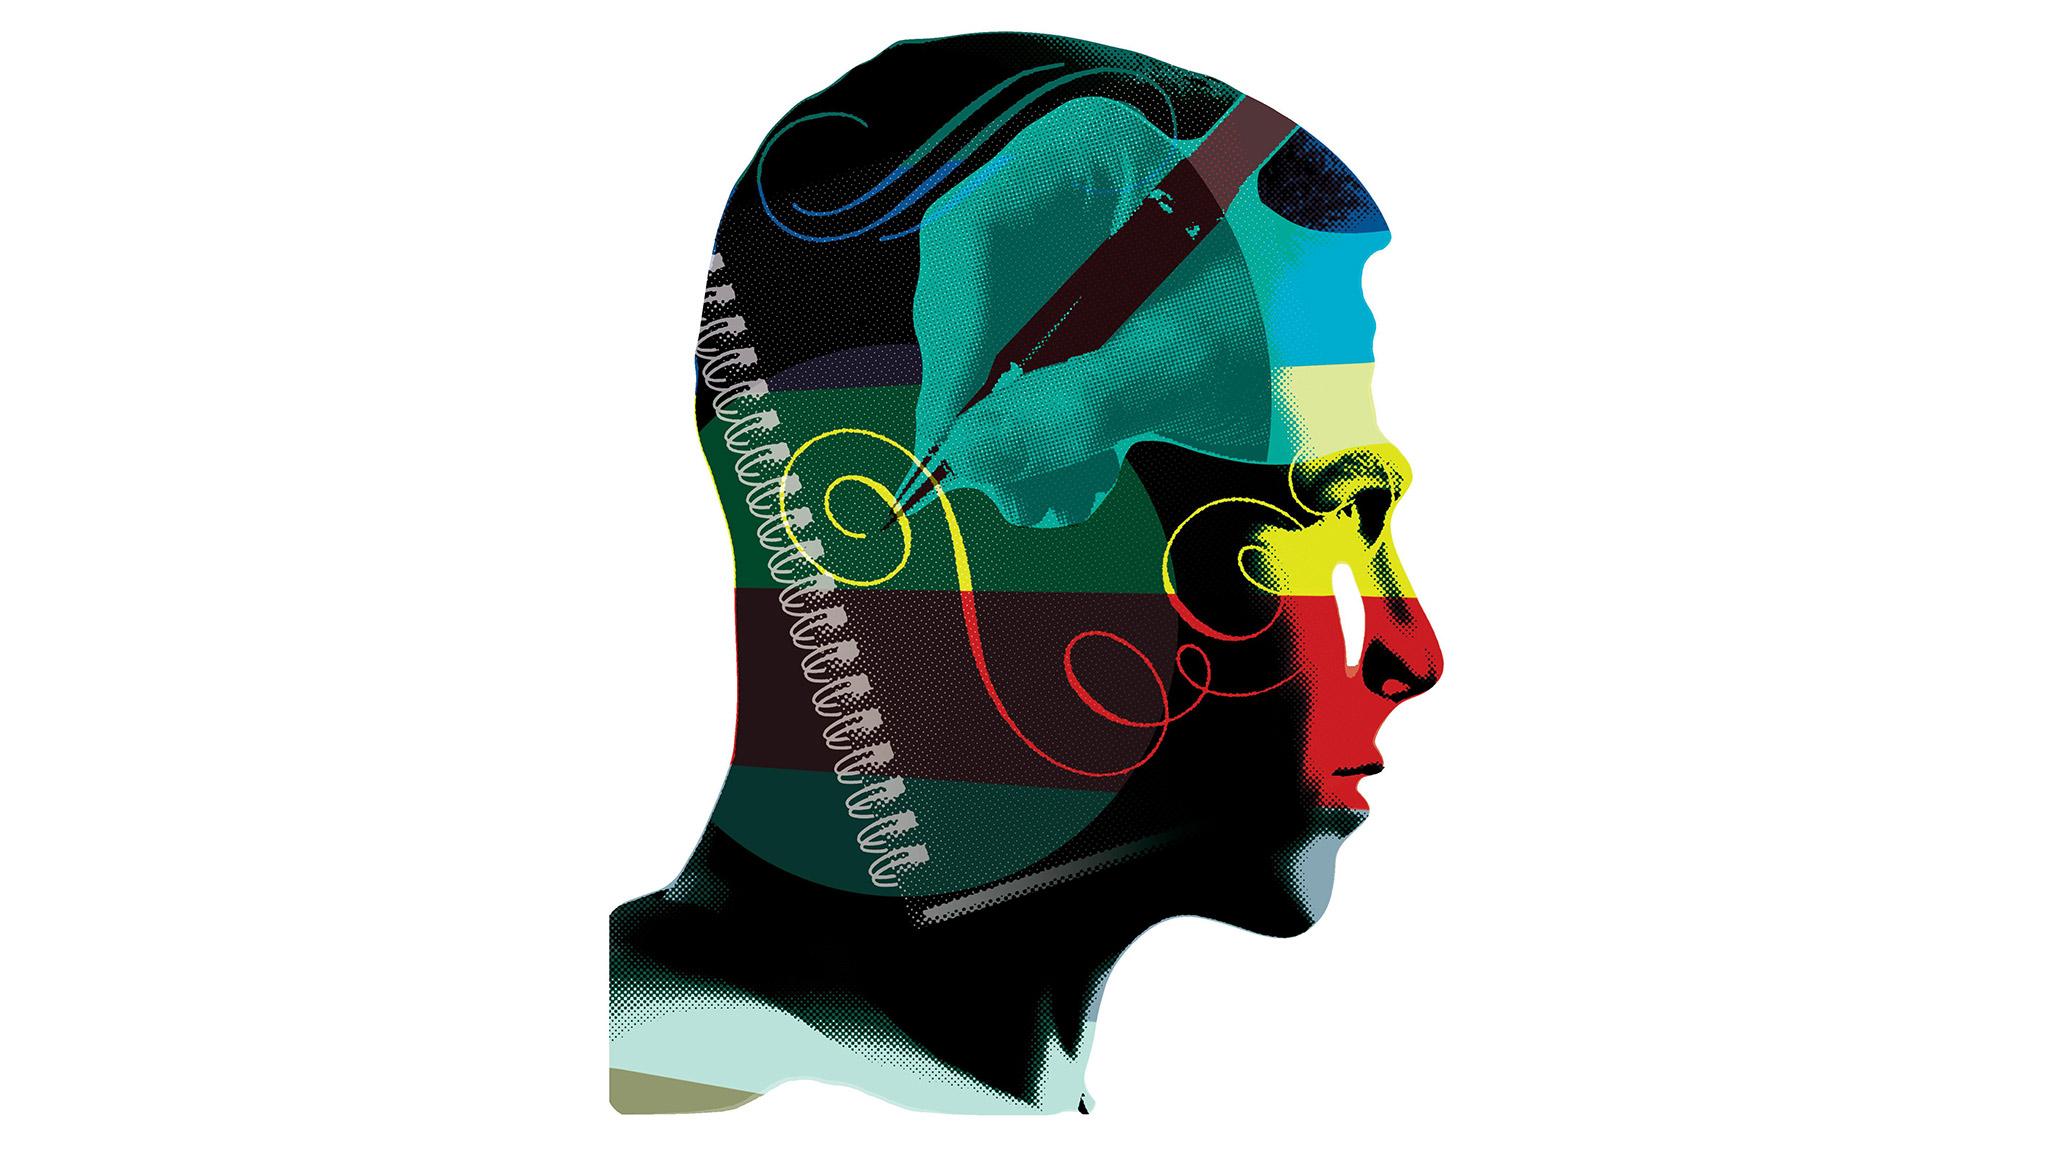 bodley head ft essay prize 2014